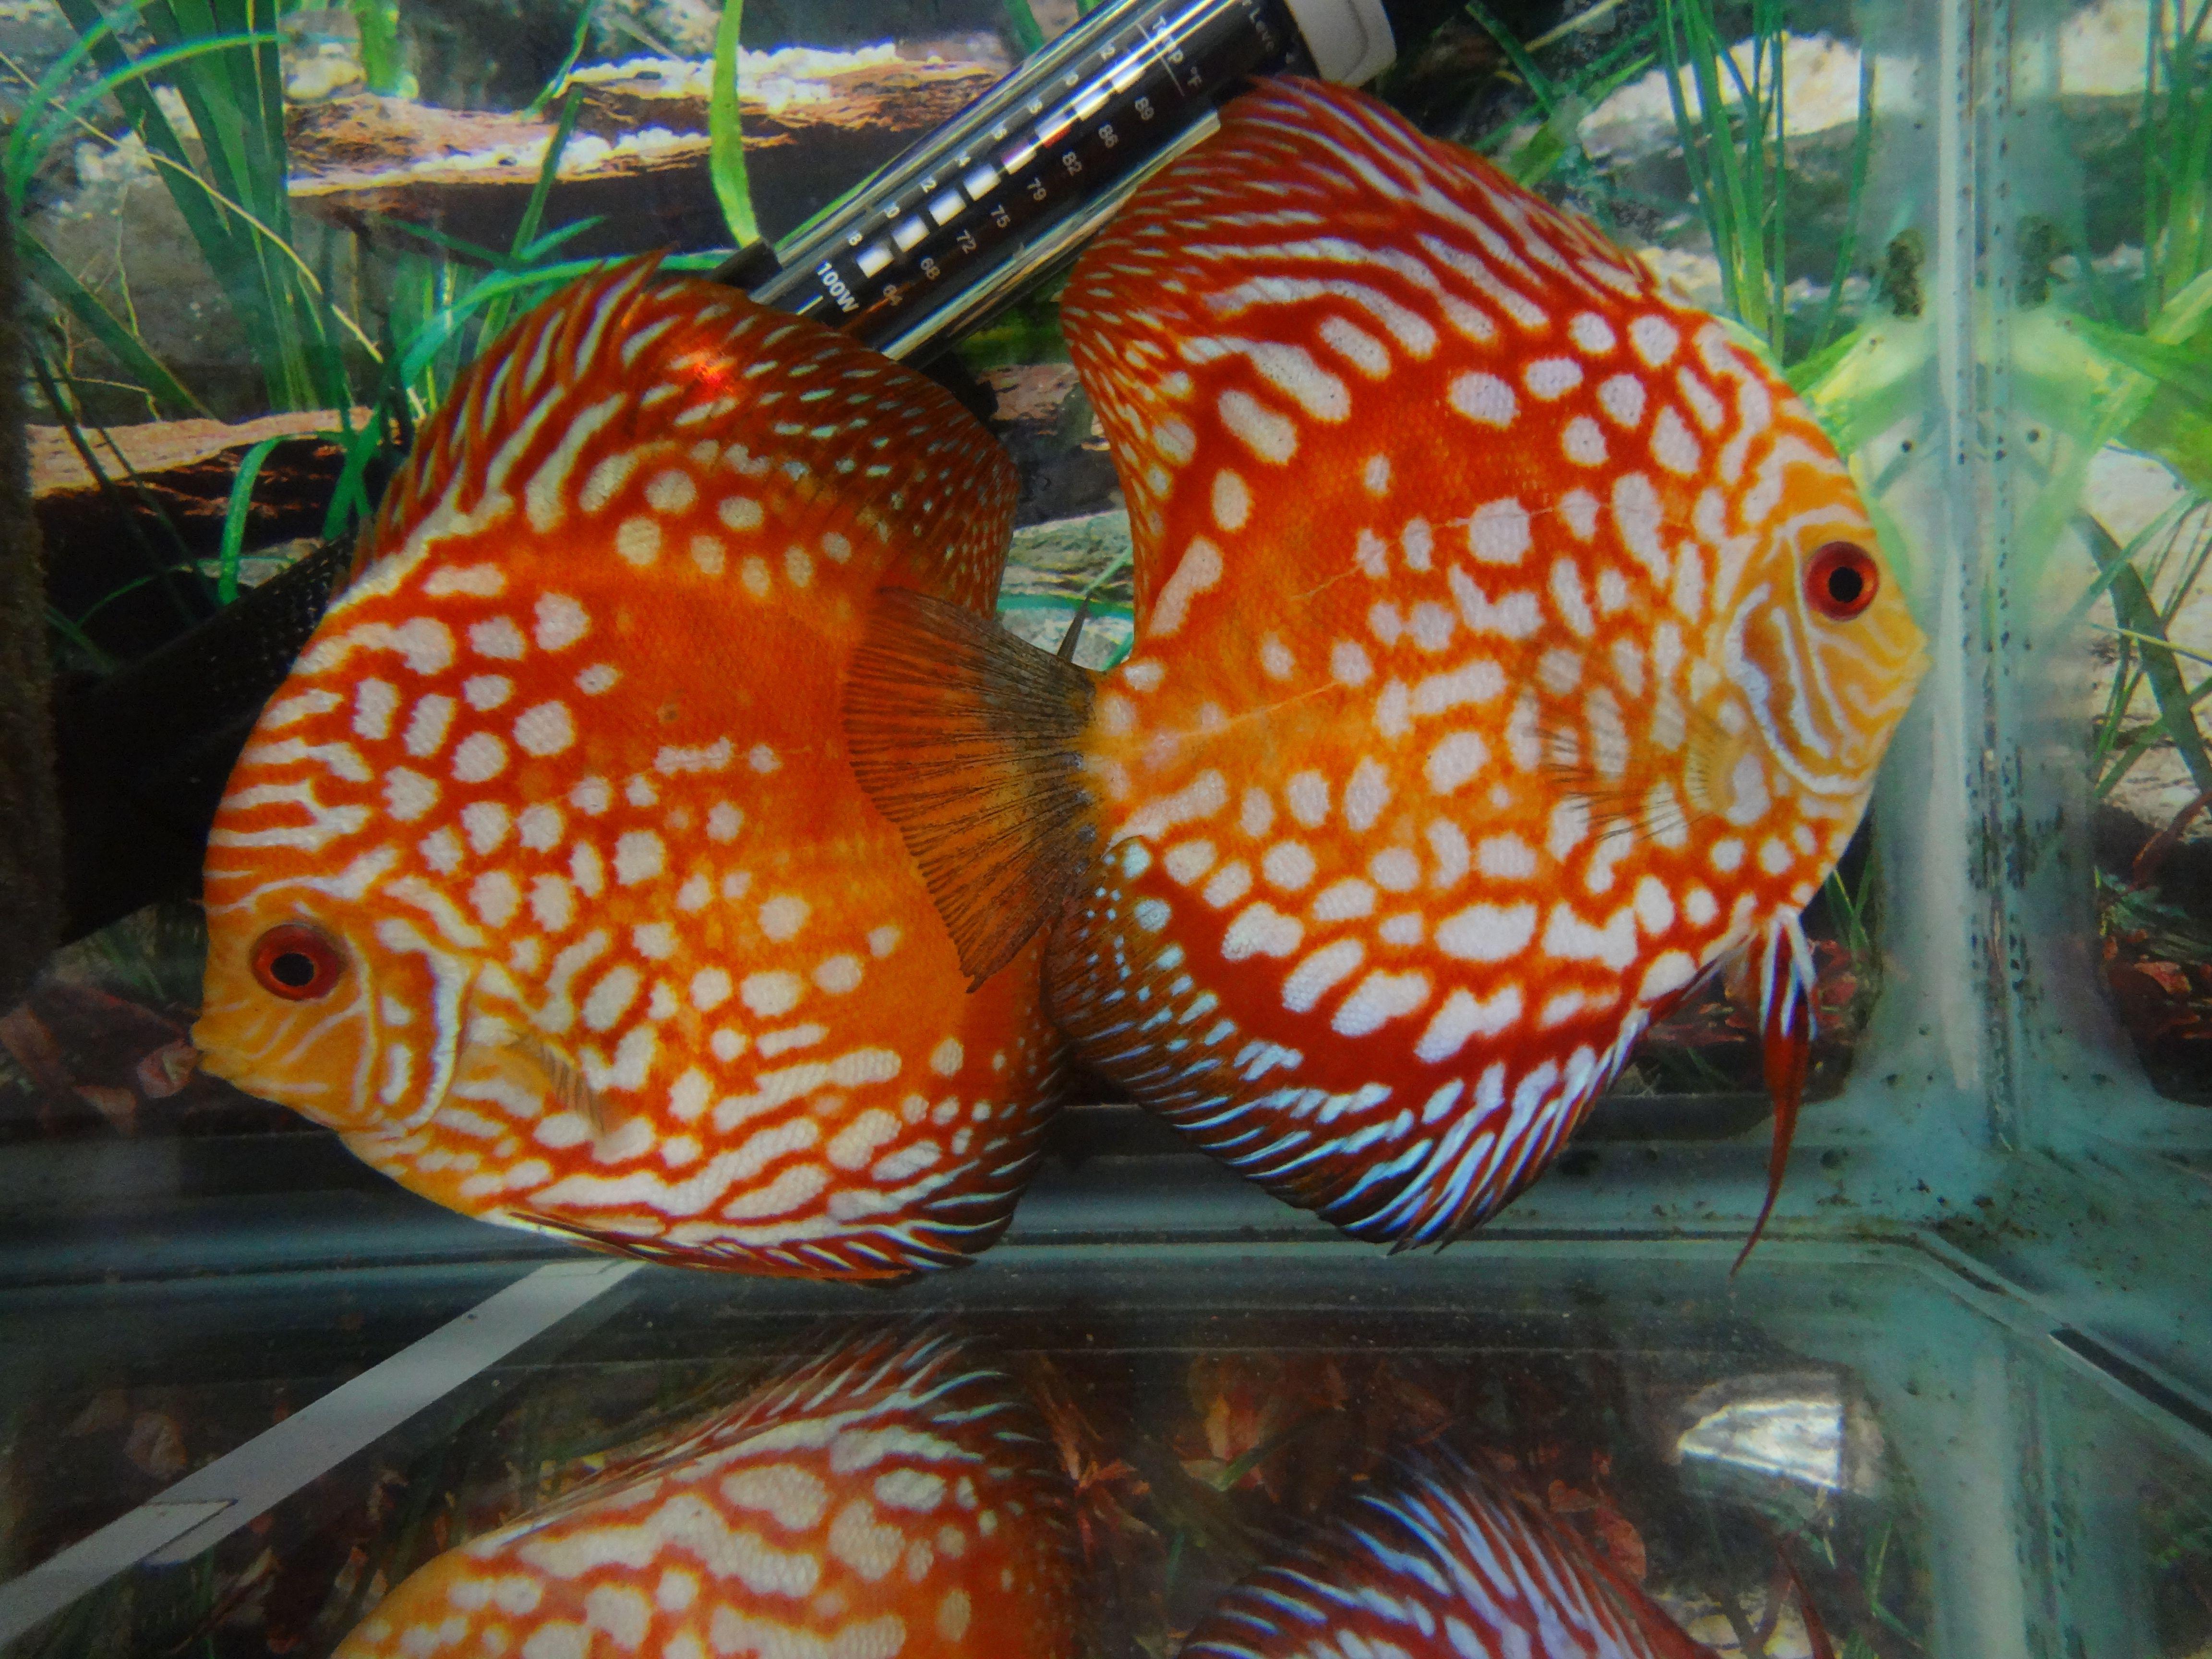 Discus Red Panda Freshwater Aquarium Fish Discus Fish Tropical Fish